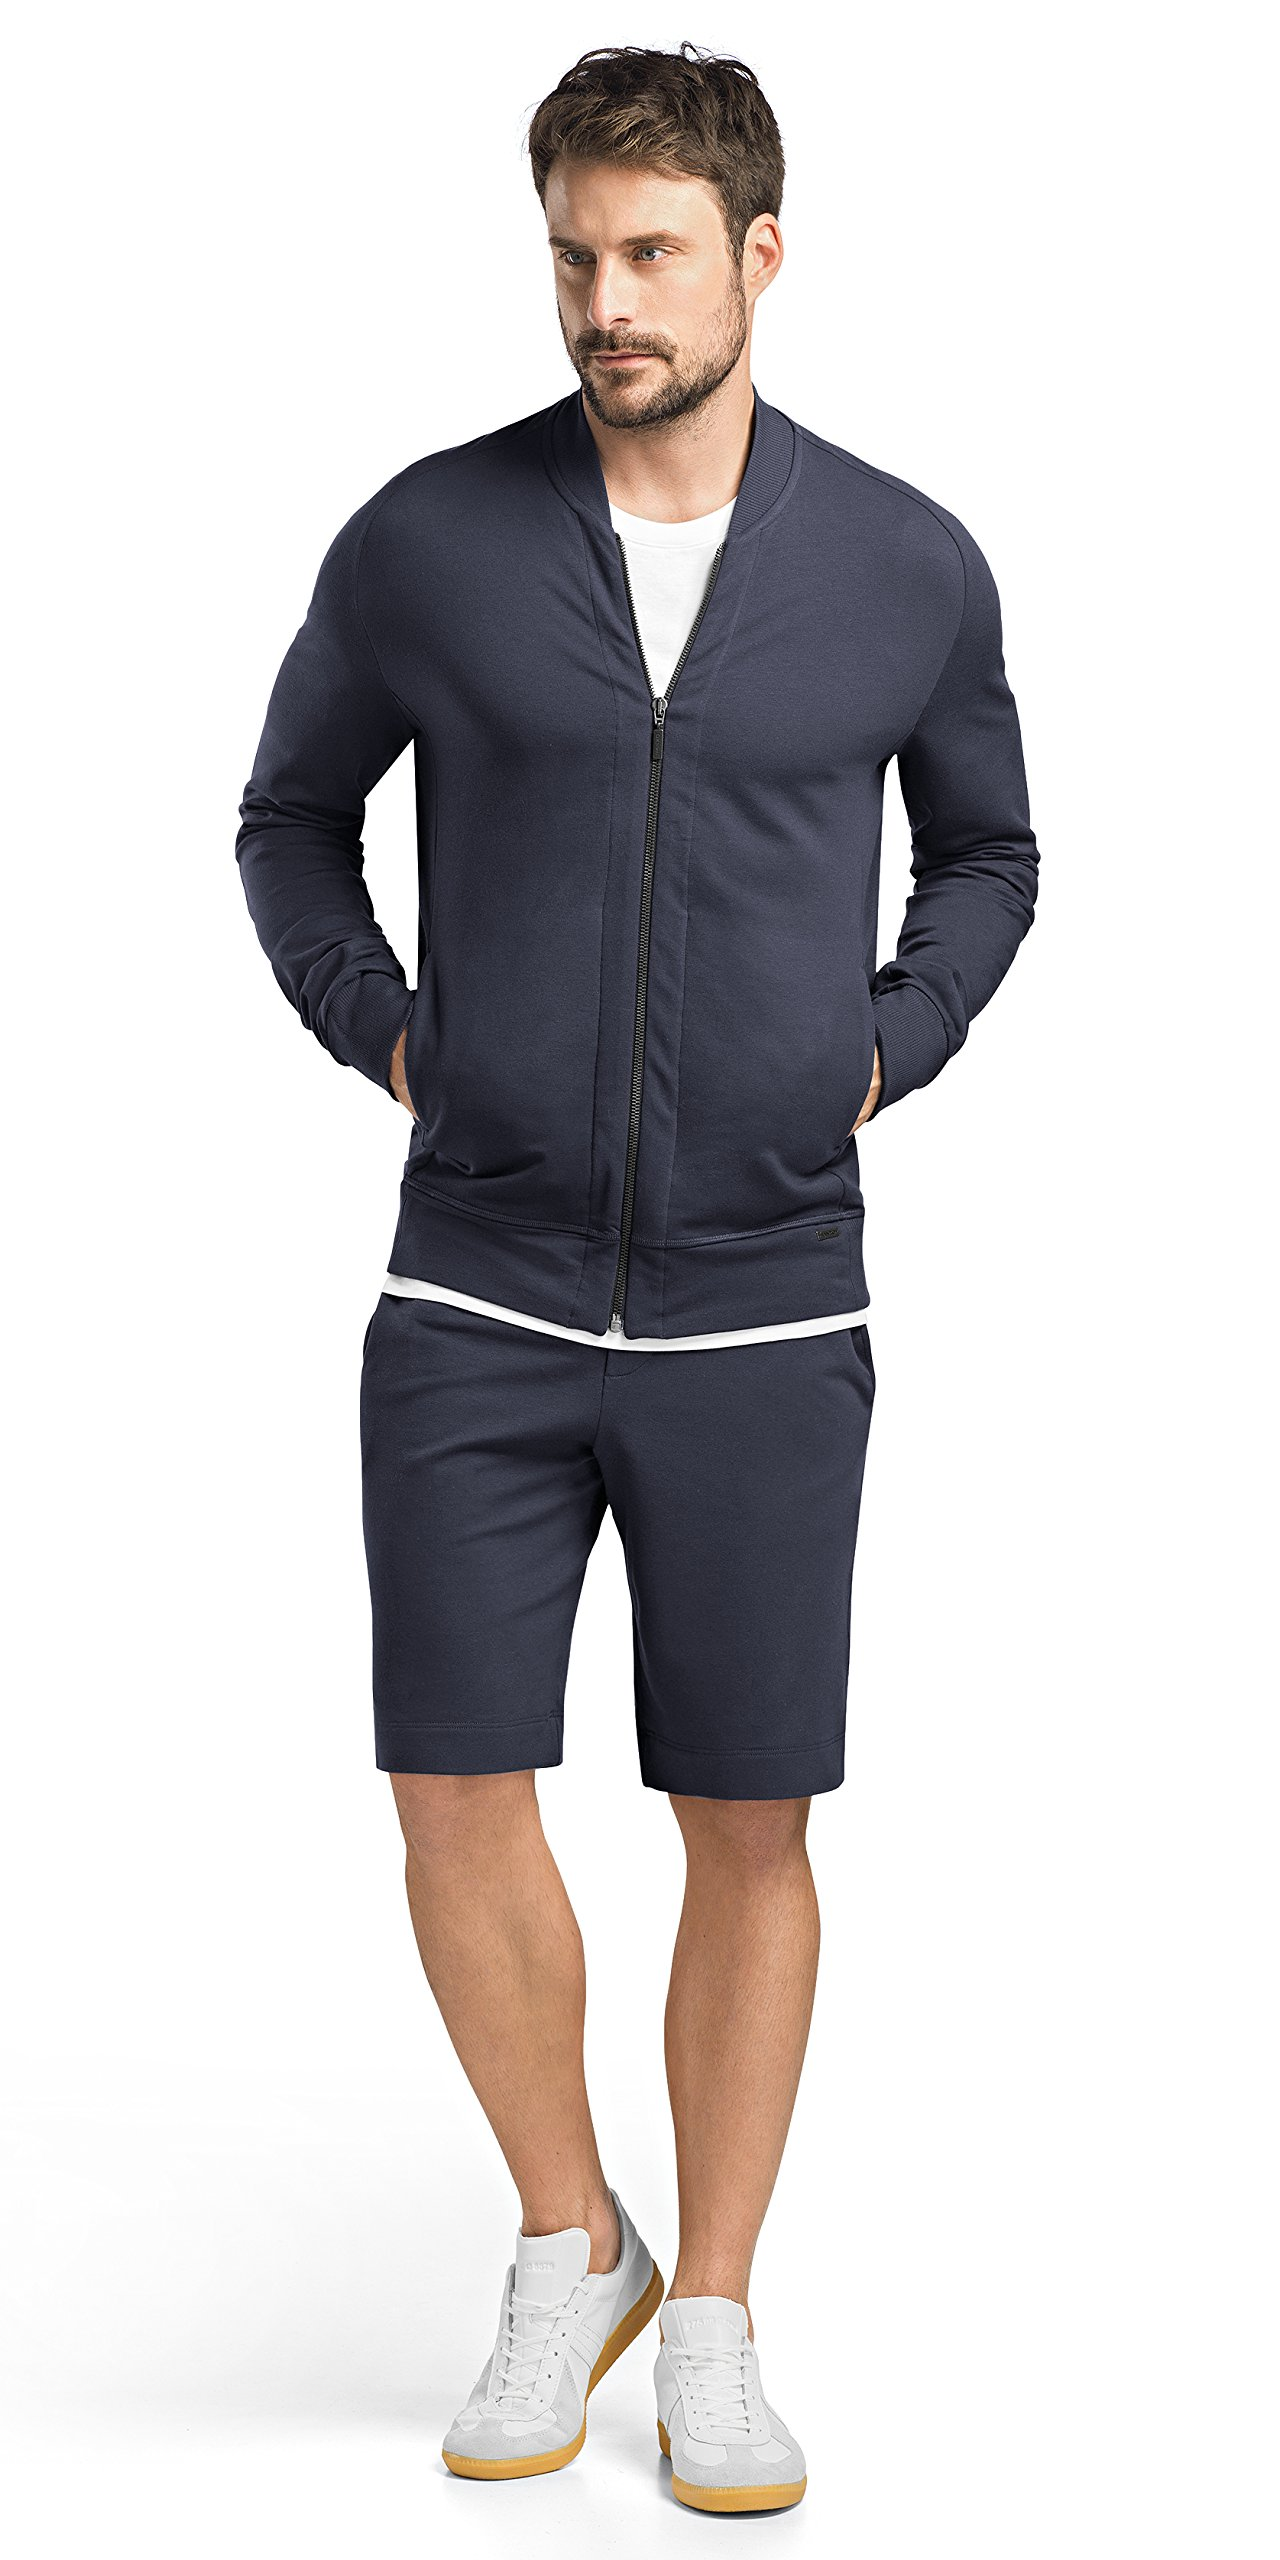 Hanro Men's Living Zip Jacket, Black Iris, X-Large by HANRO